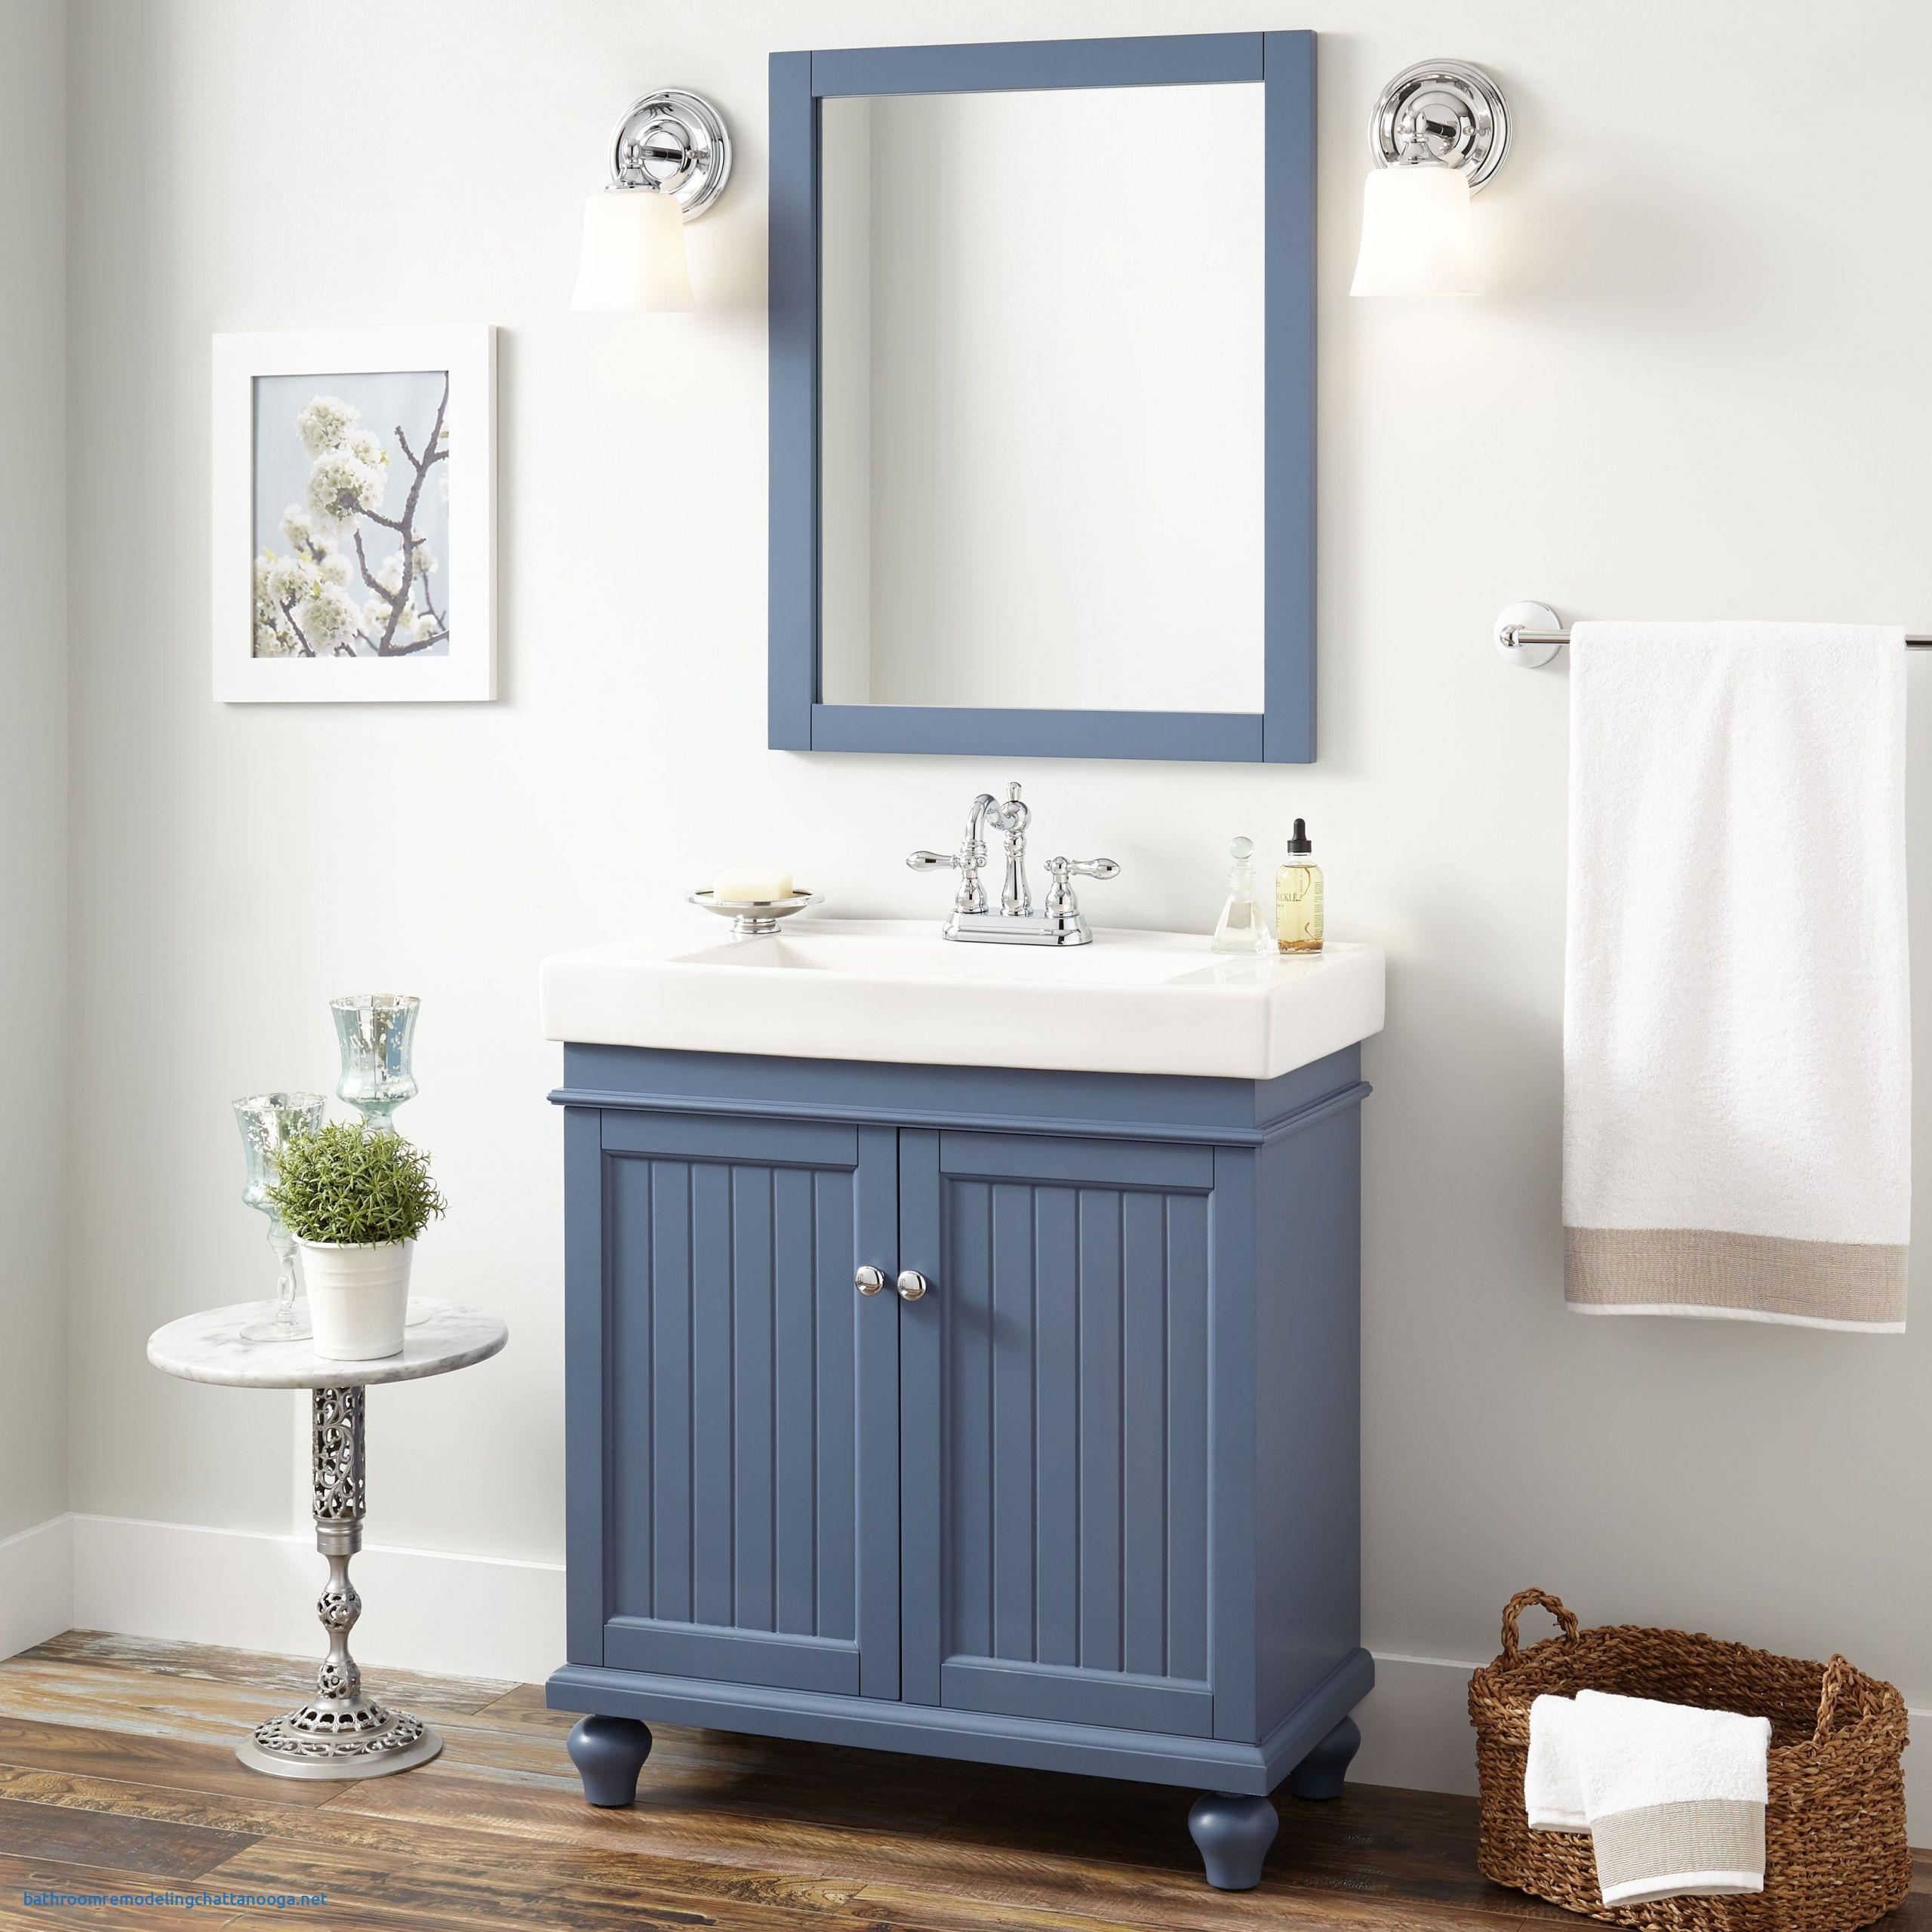 Best Of Bathroom Vanity Design Ideas Bathroom Remodeling Bathroomdecor Ba In 2020 Home Depot Bathroom Vanity Bathroom Vanity Designs Unique Bathroom Vanity